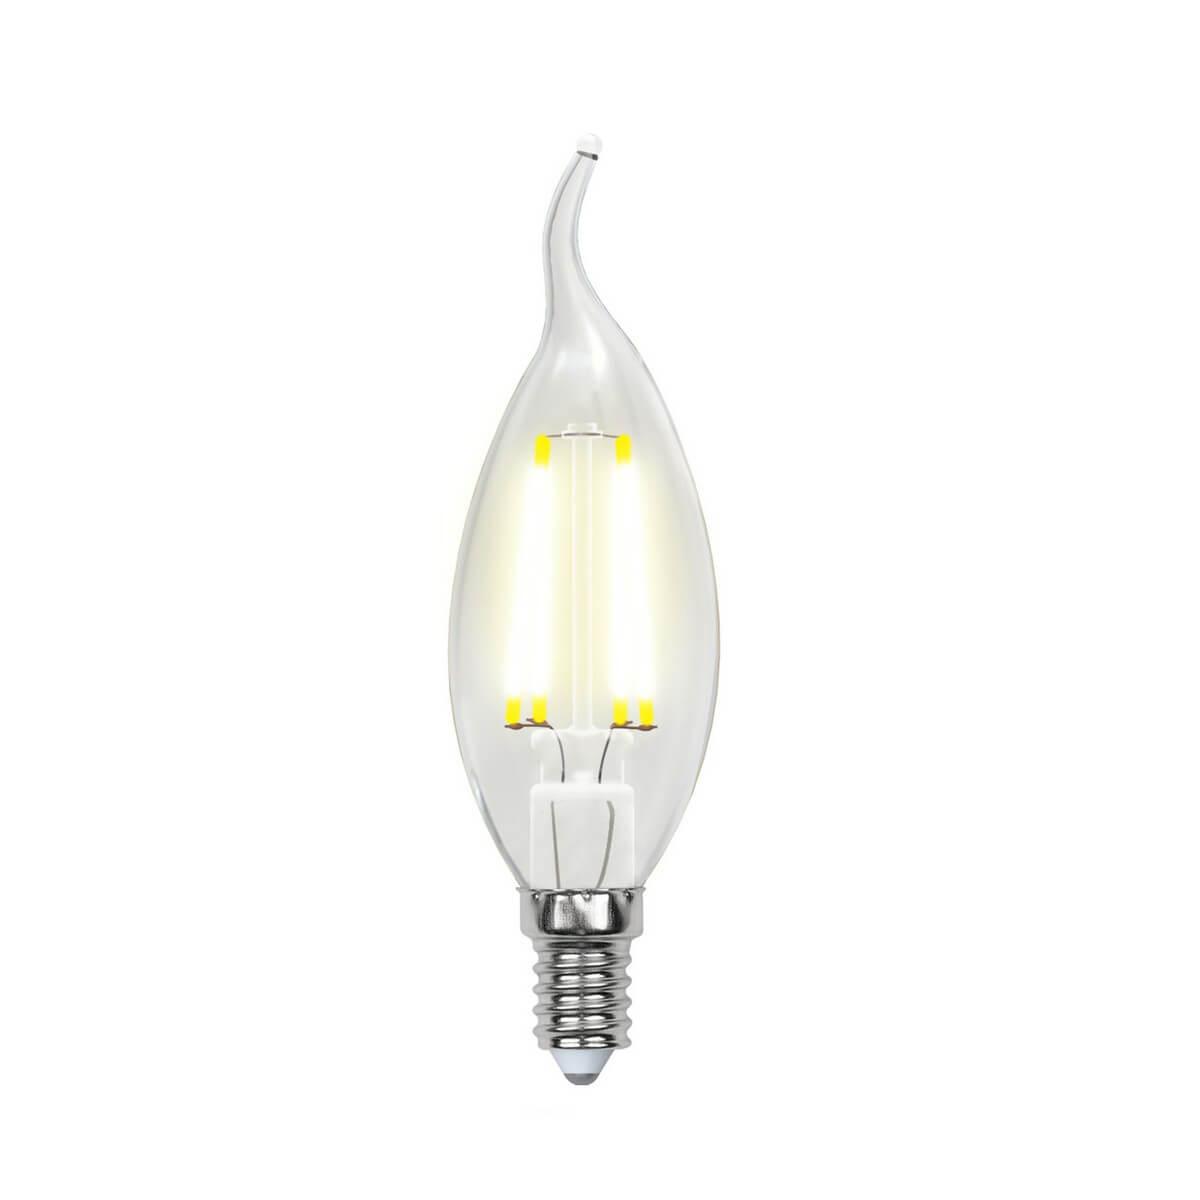 Лампочка Uniel LED-CW35-5W/NW/E14/CL/DIM GLA01TR AIR DIM